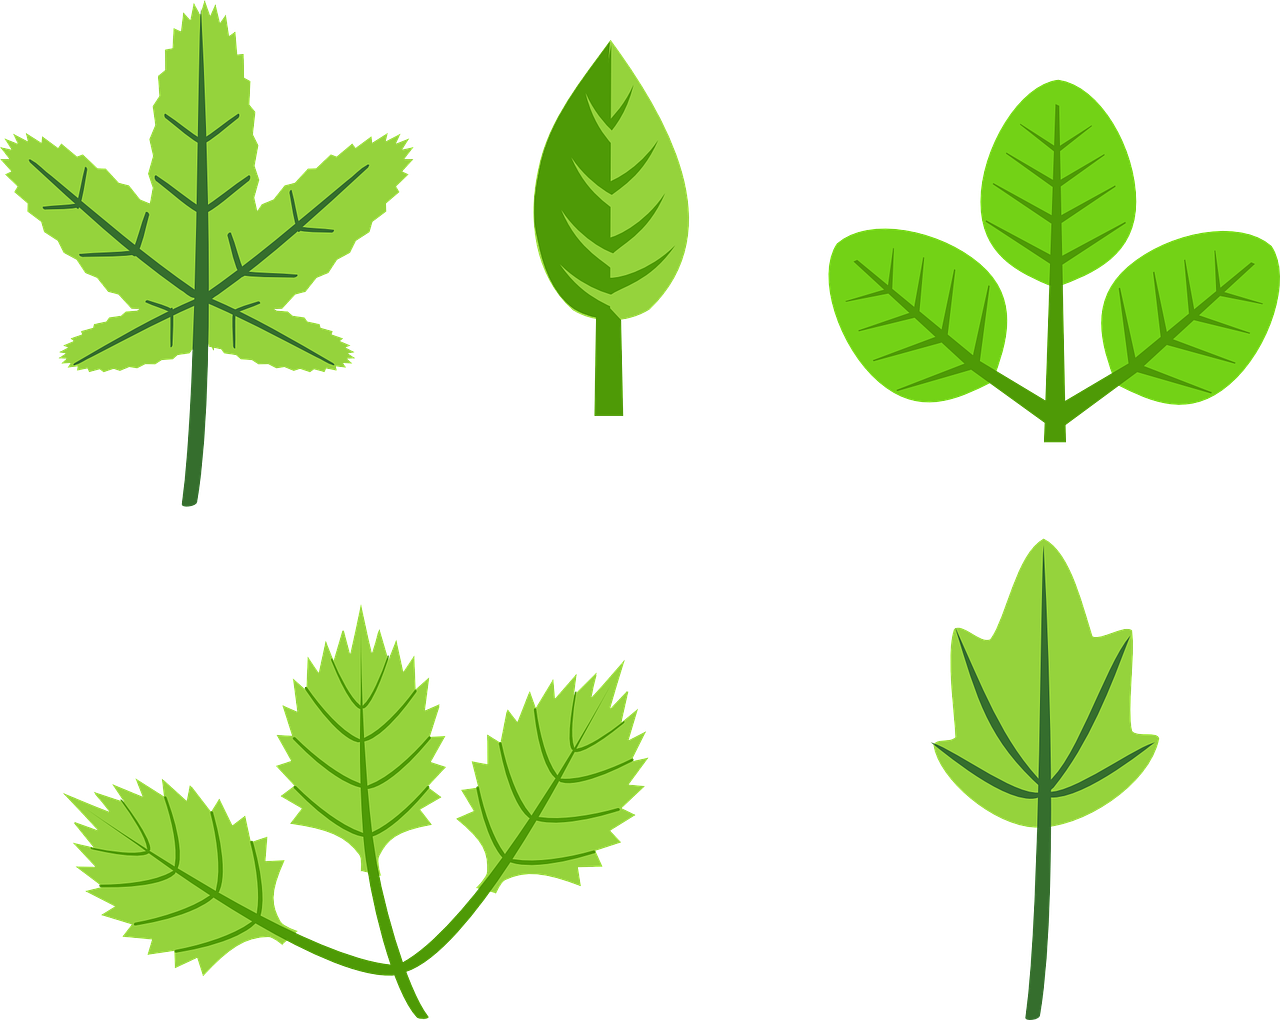 clipart Park leaf tree green. Vector bushes flat design